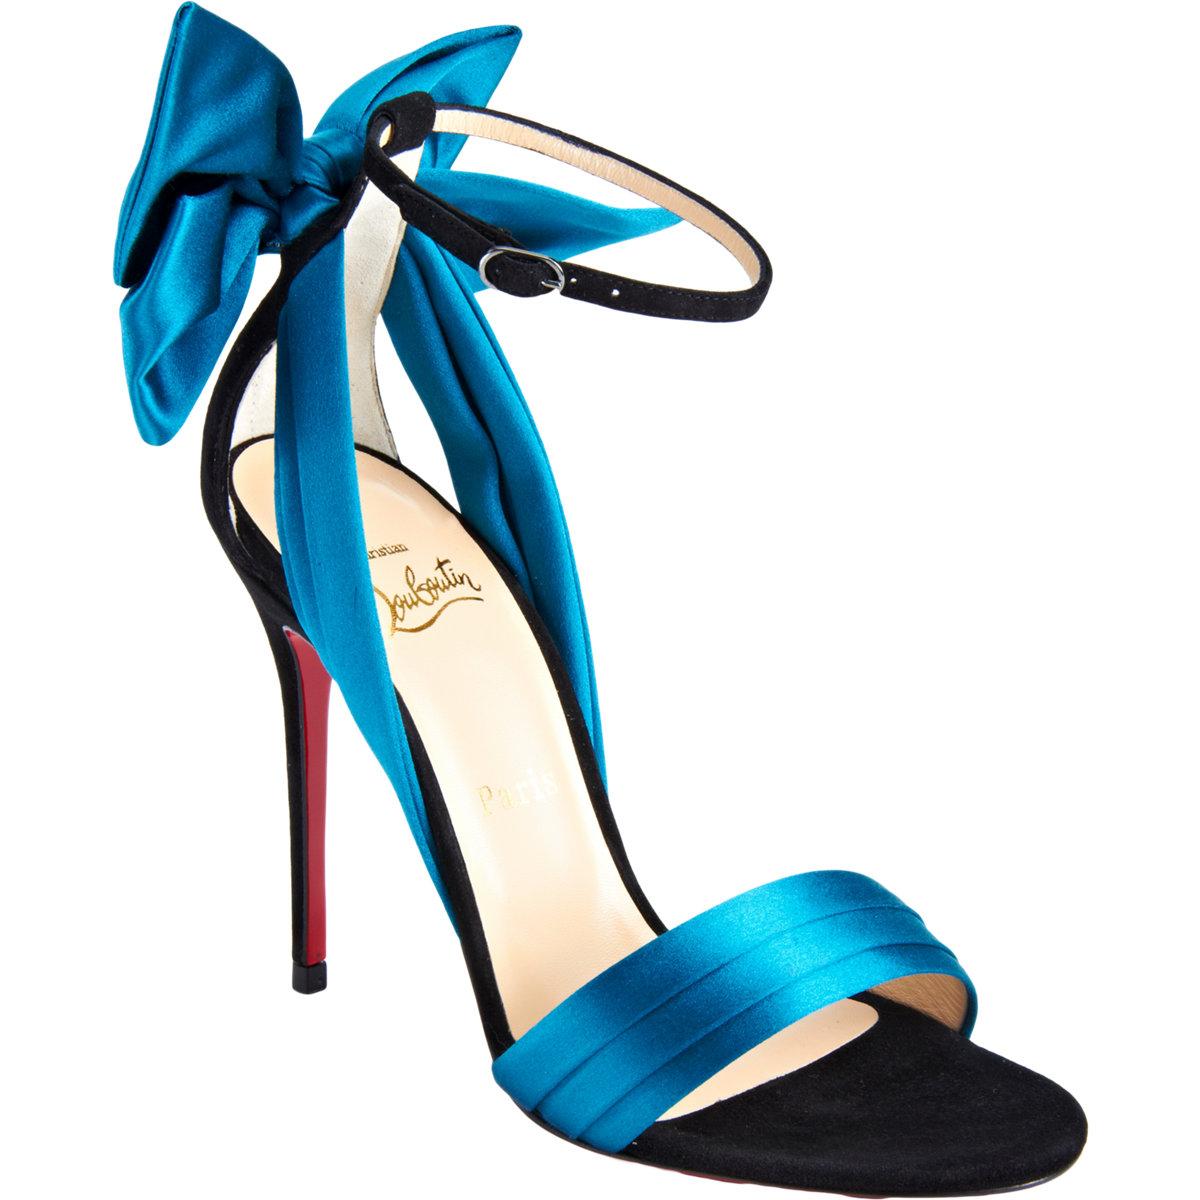 new product 2c3a5 866df Shoeniverse: Louboutin Week - CHRISTIAN LOUBOUTIN Blue ...